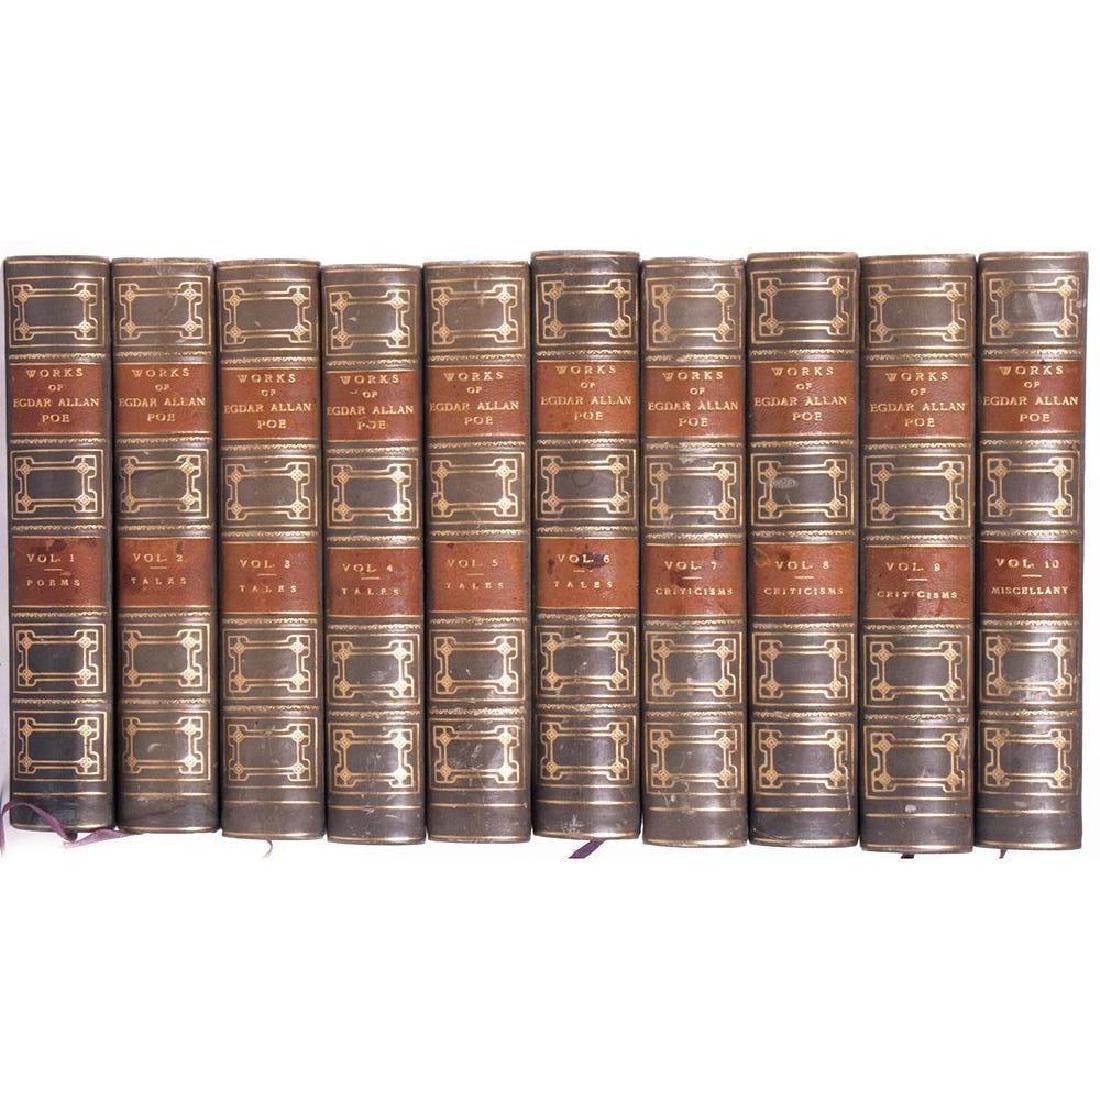 Ten volumes by Edgar Allan Poe